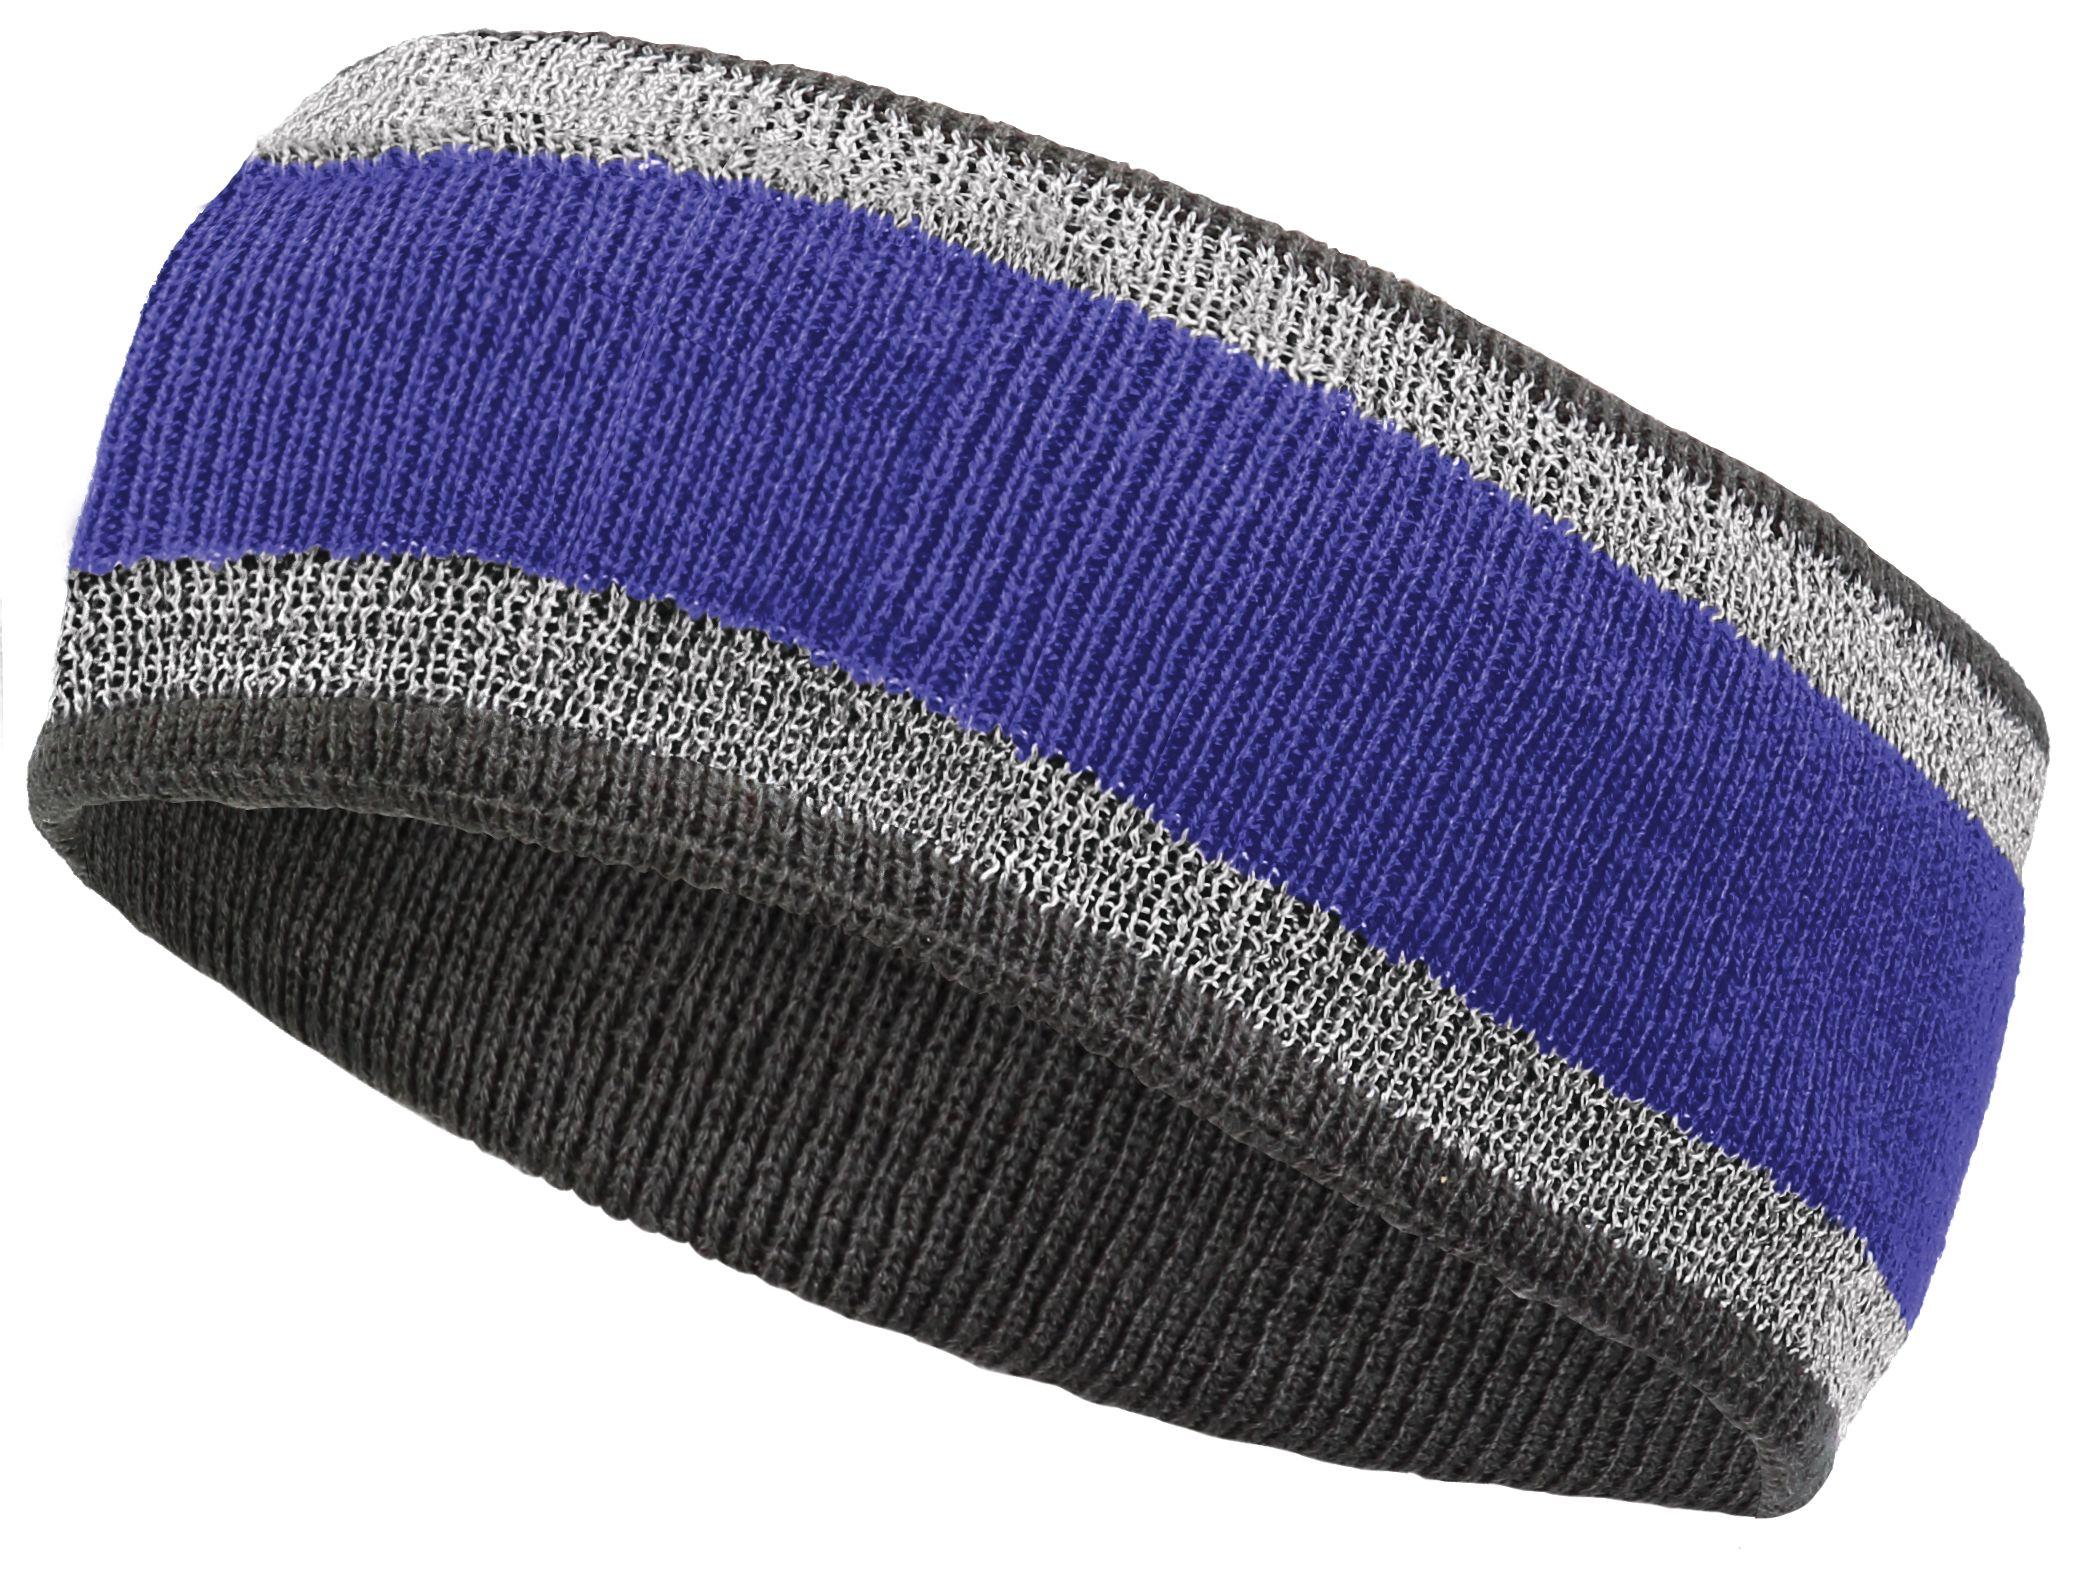 Reflective Headband - PURPLE/CARBON